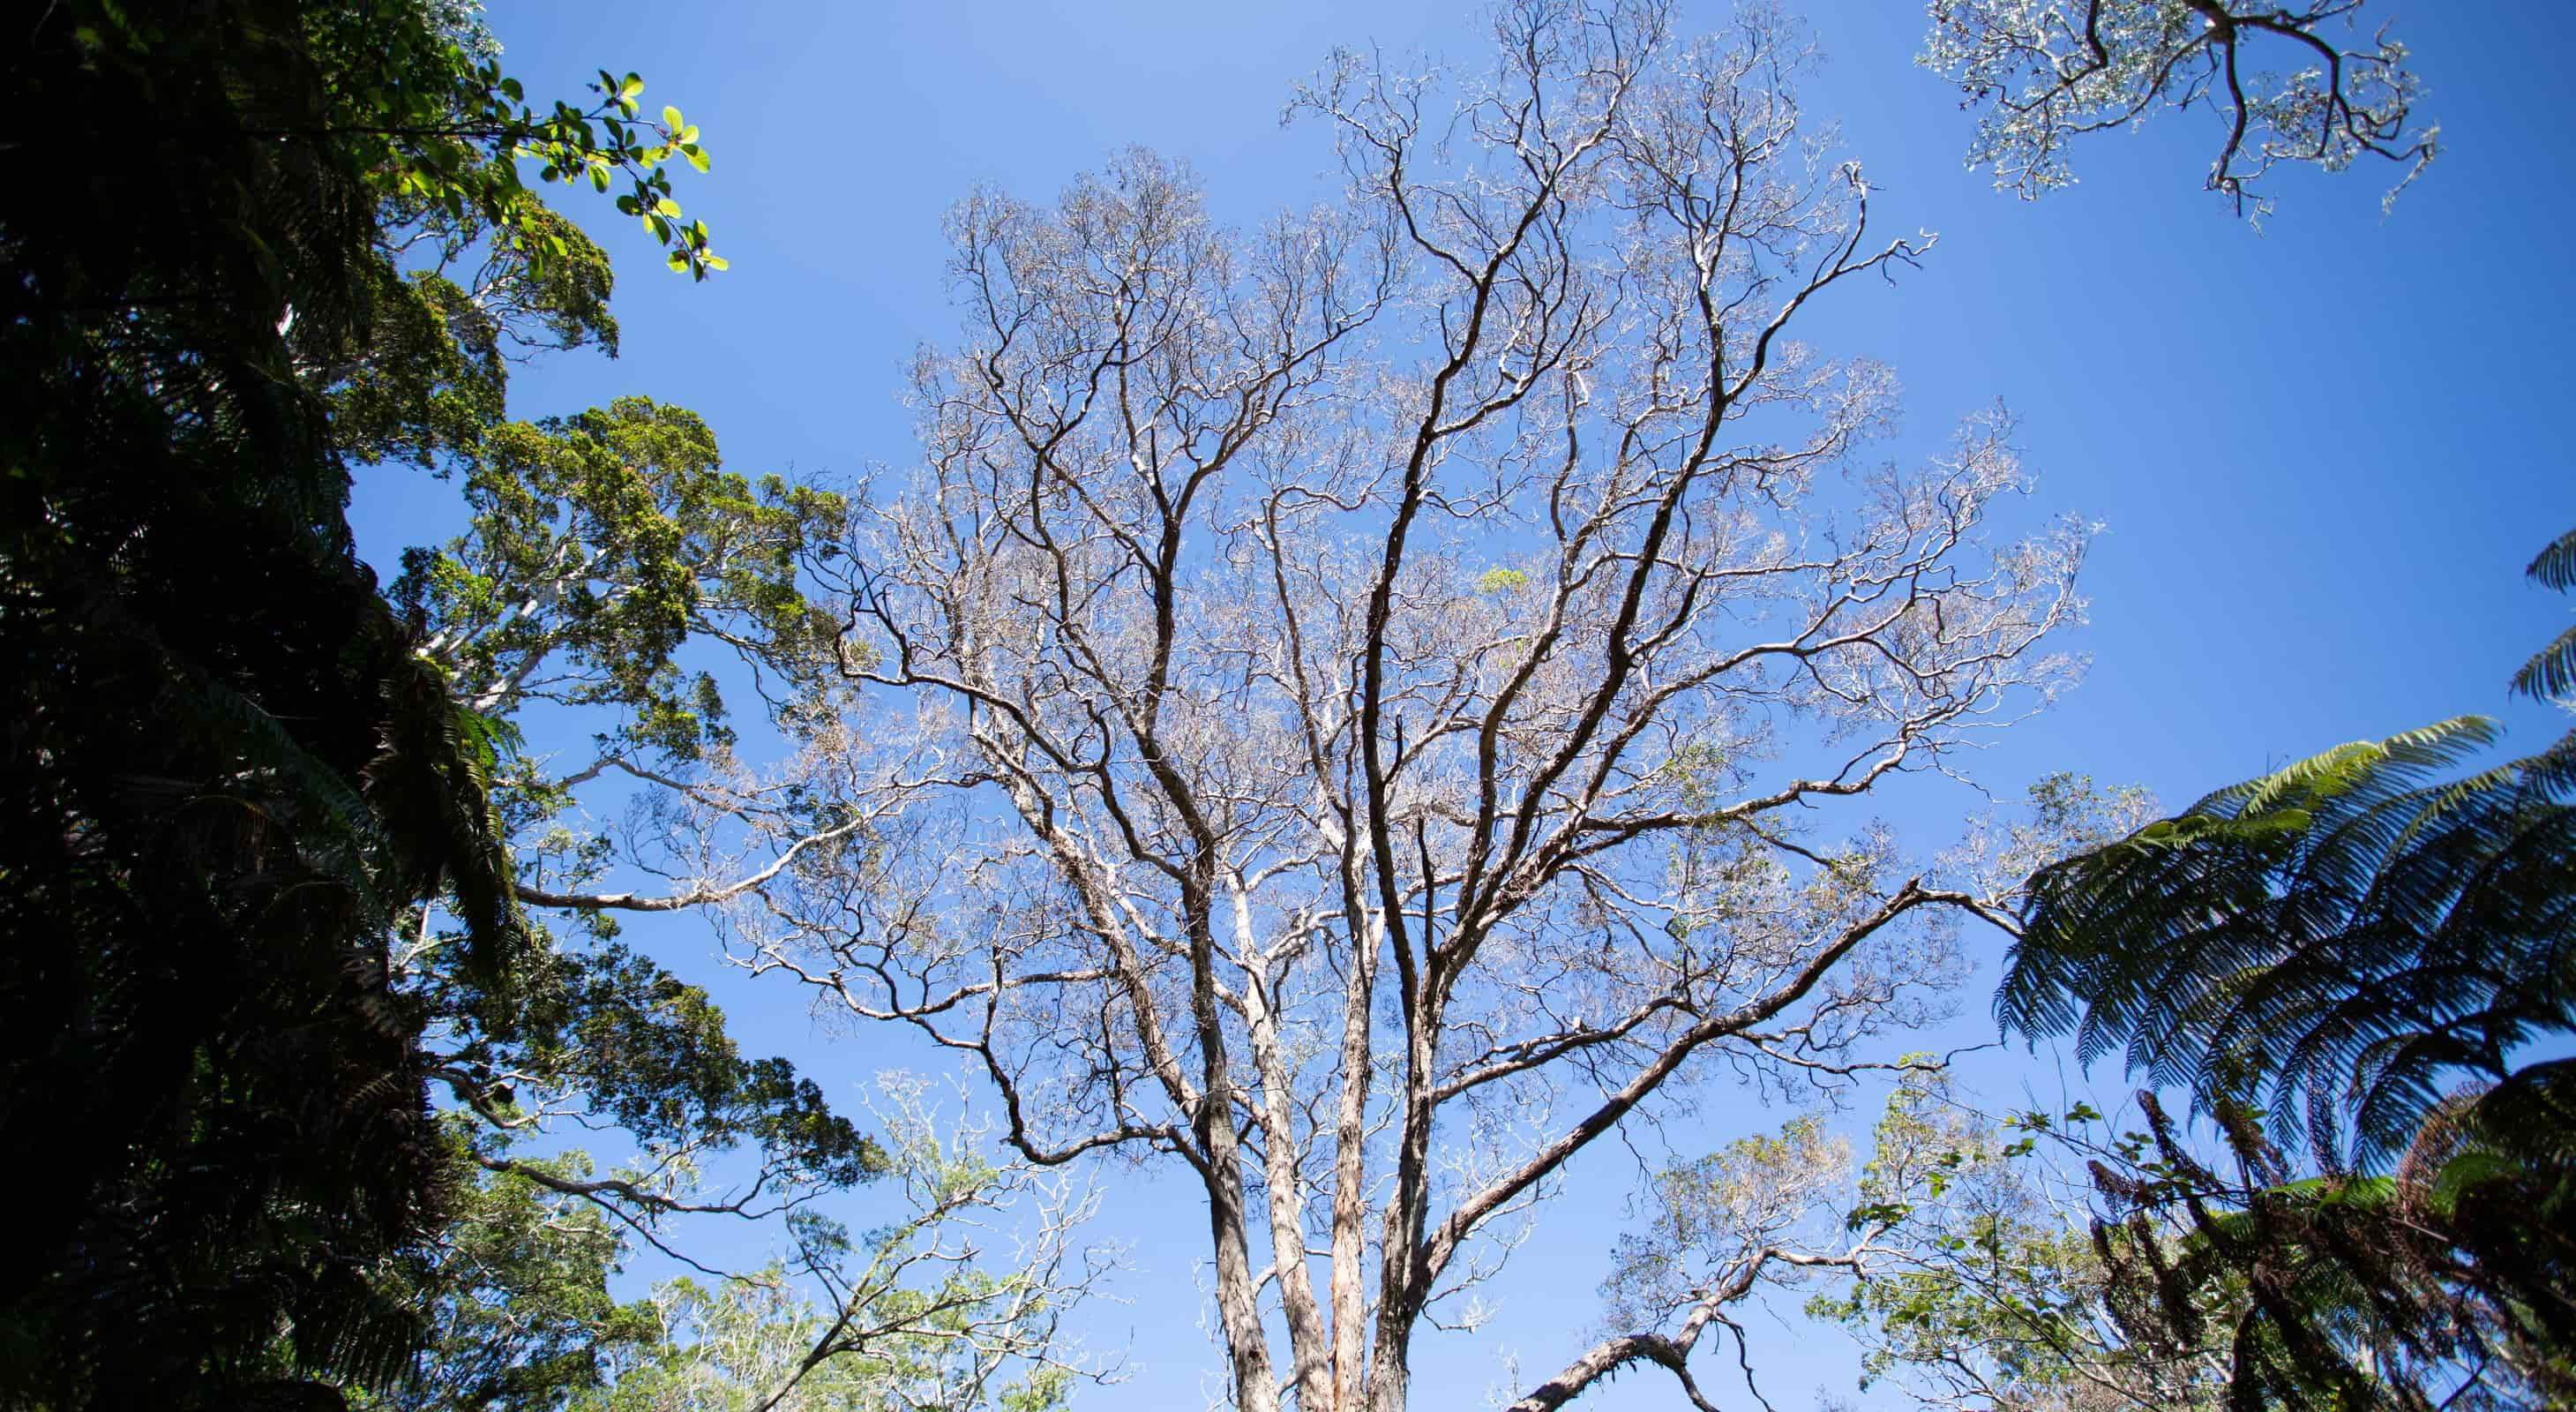 A large Ohia tree with ROD